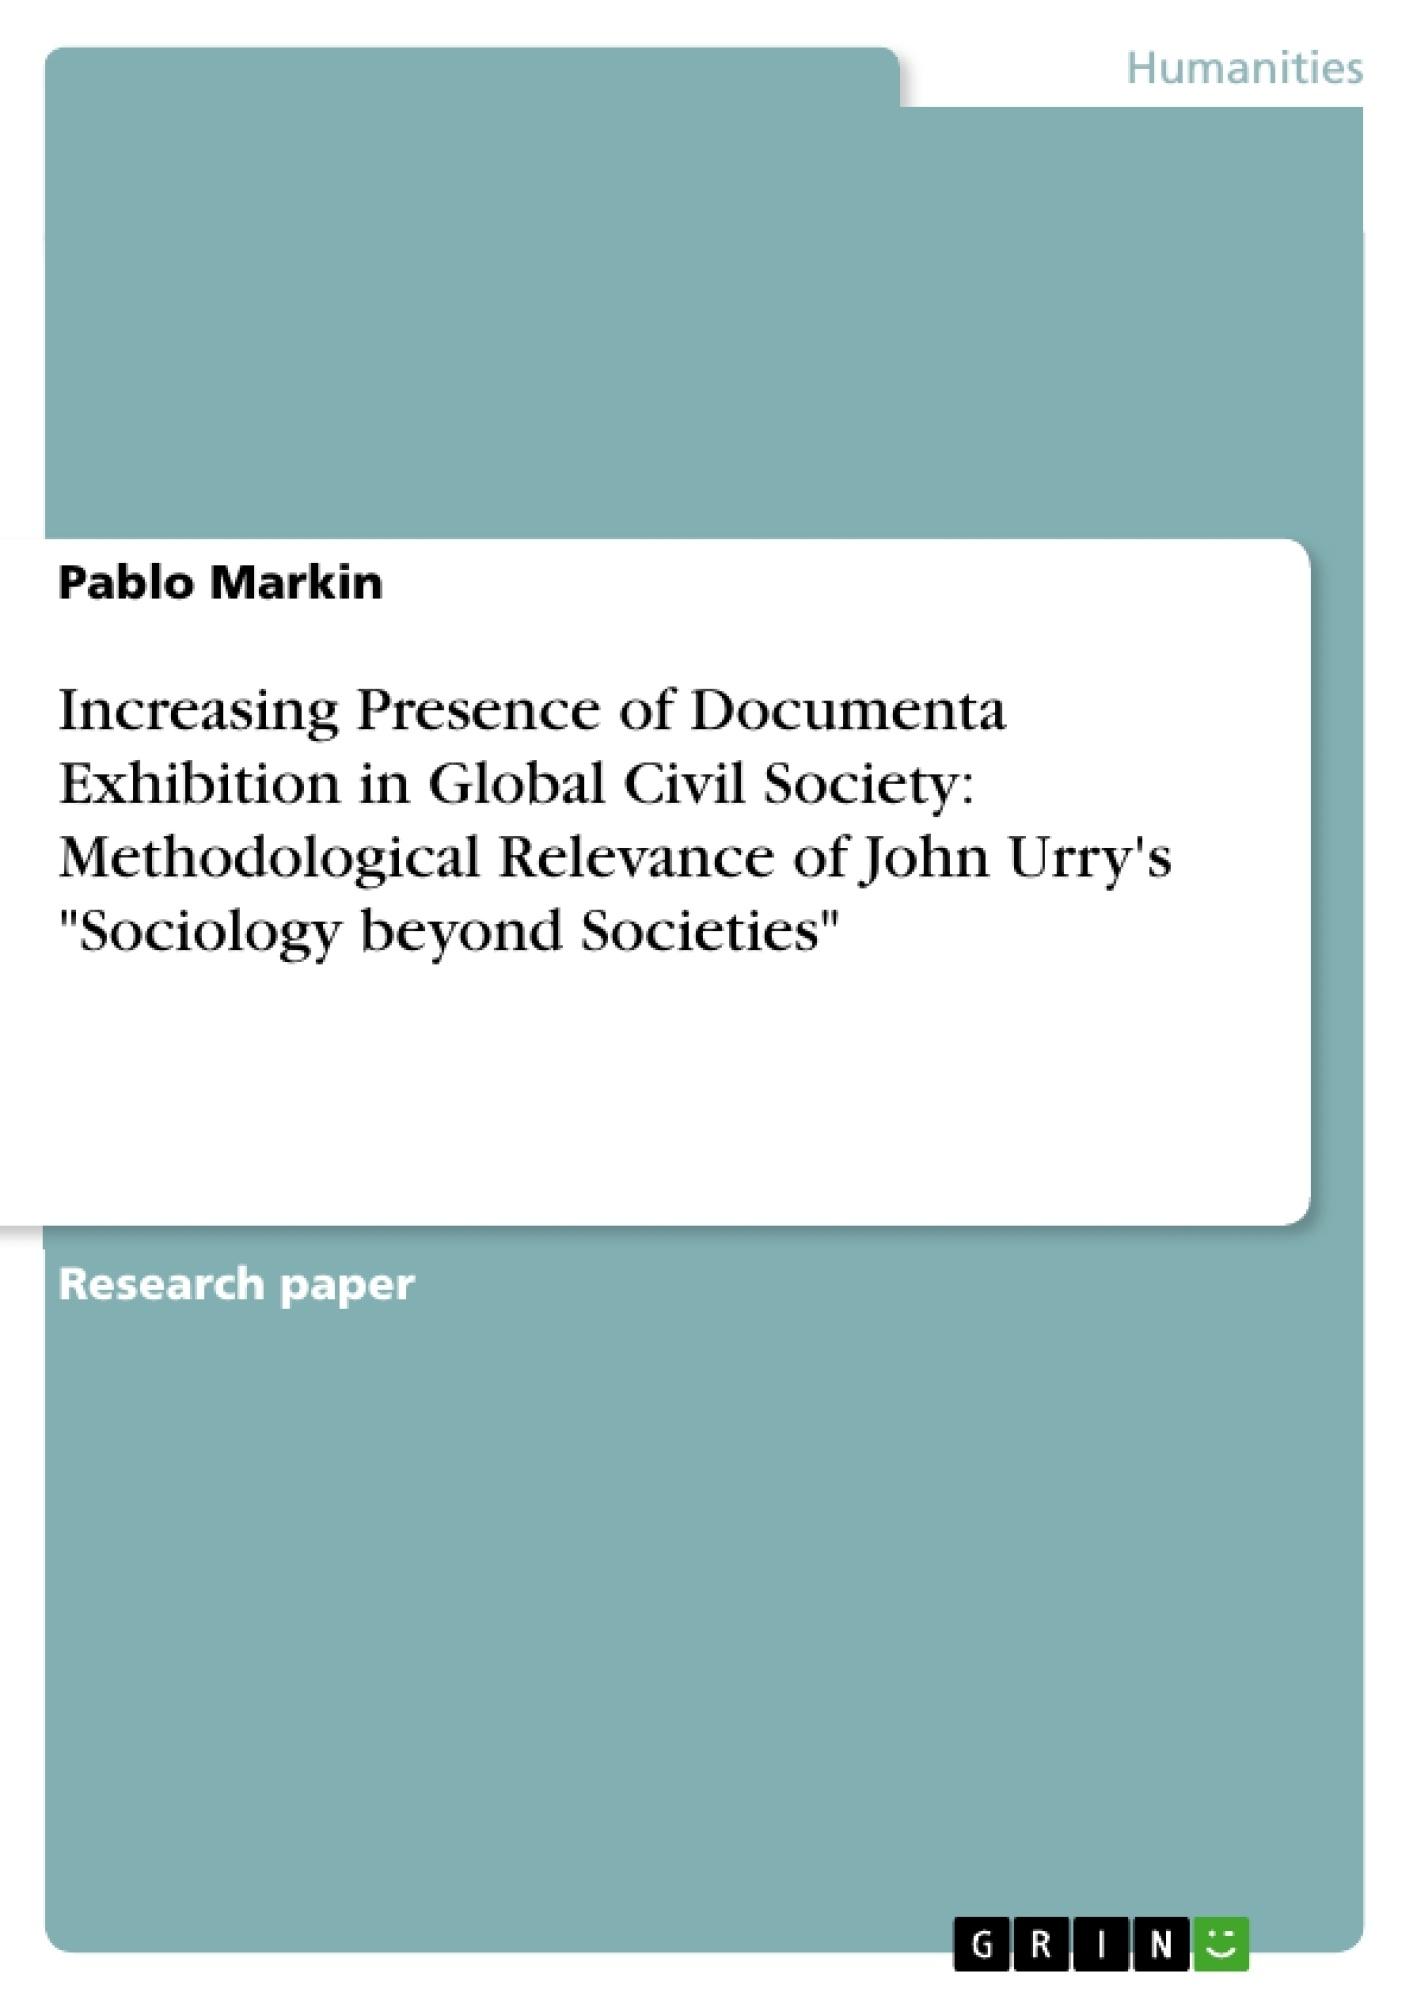 "Title: Increasing Presence of Documenta Exhibition in Global Civil Society: Methodological Relevance of John Urry's ""Sociology beyond Societies"""